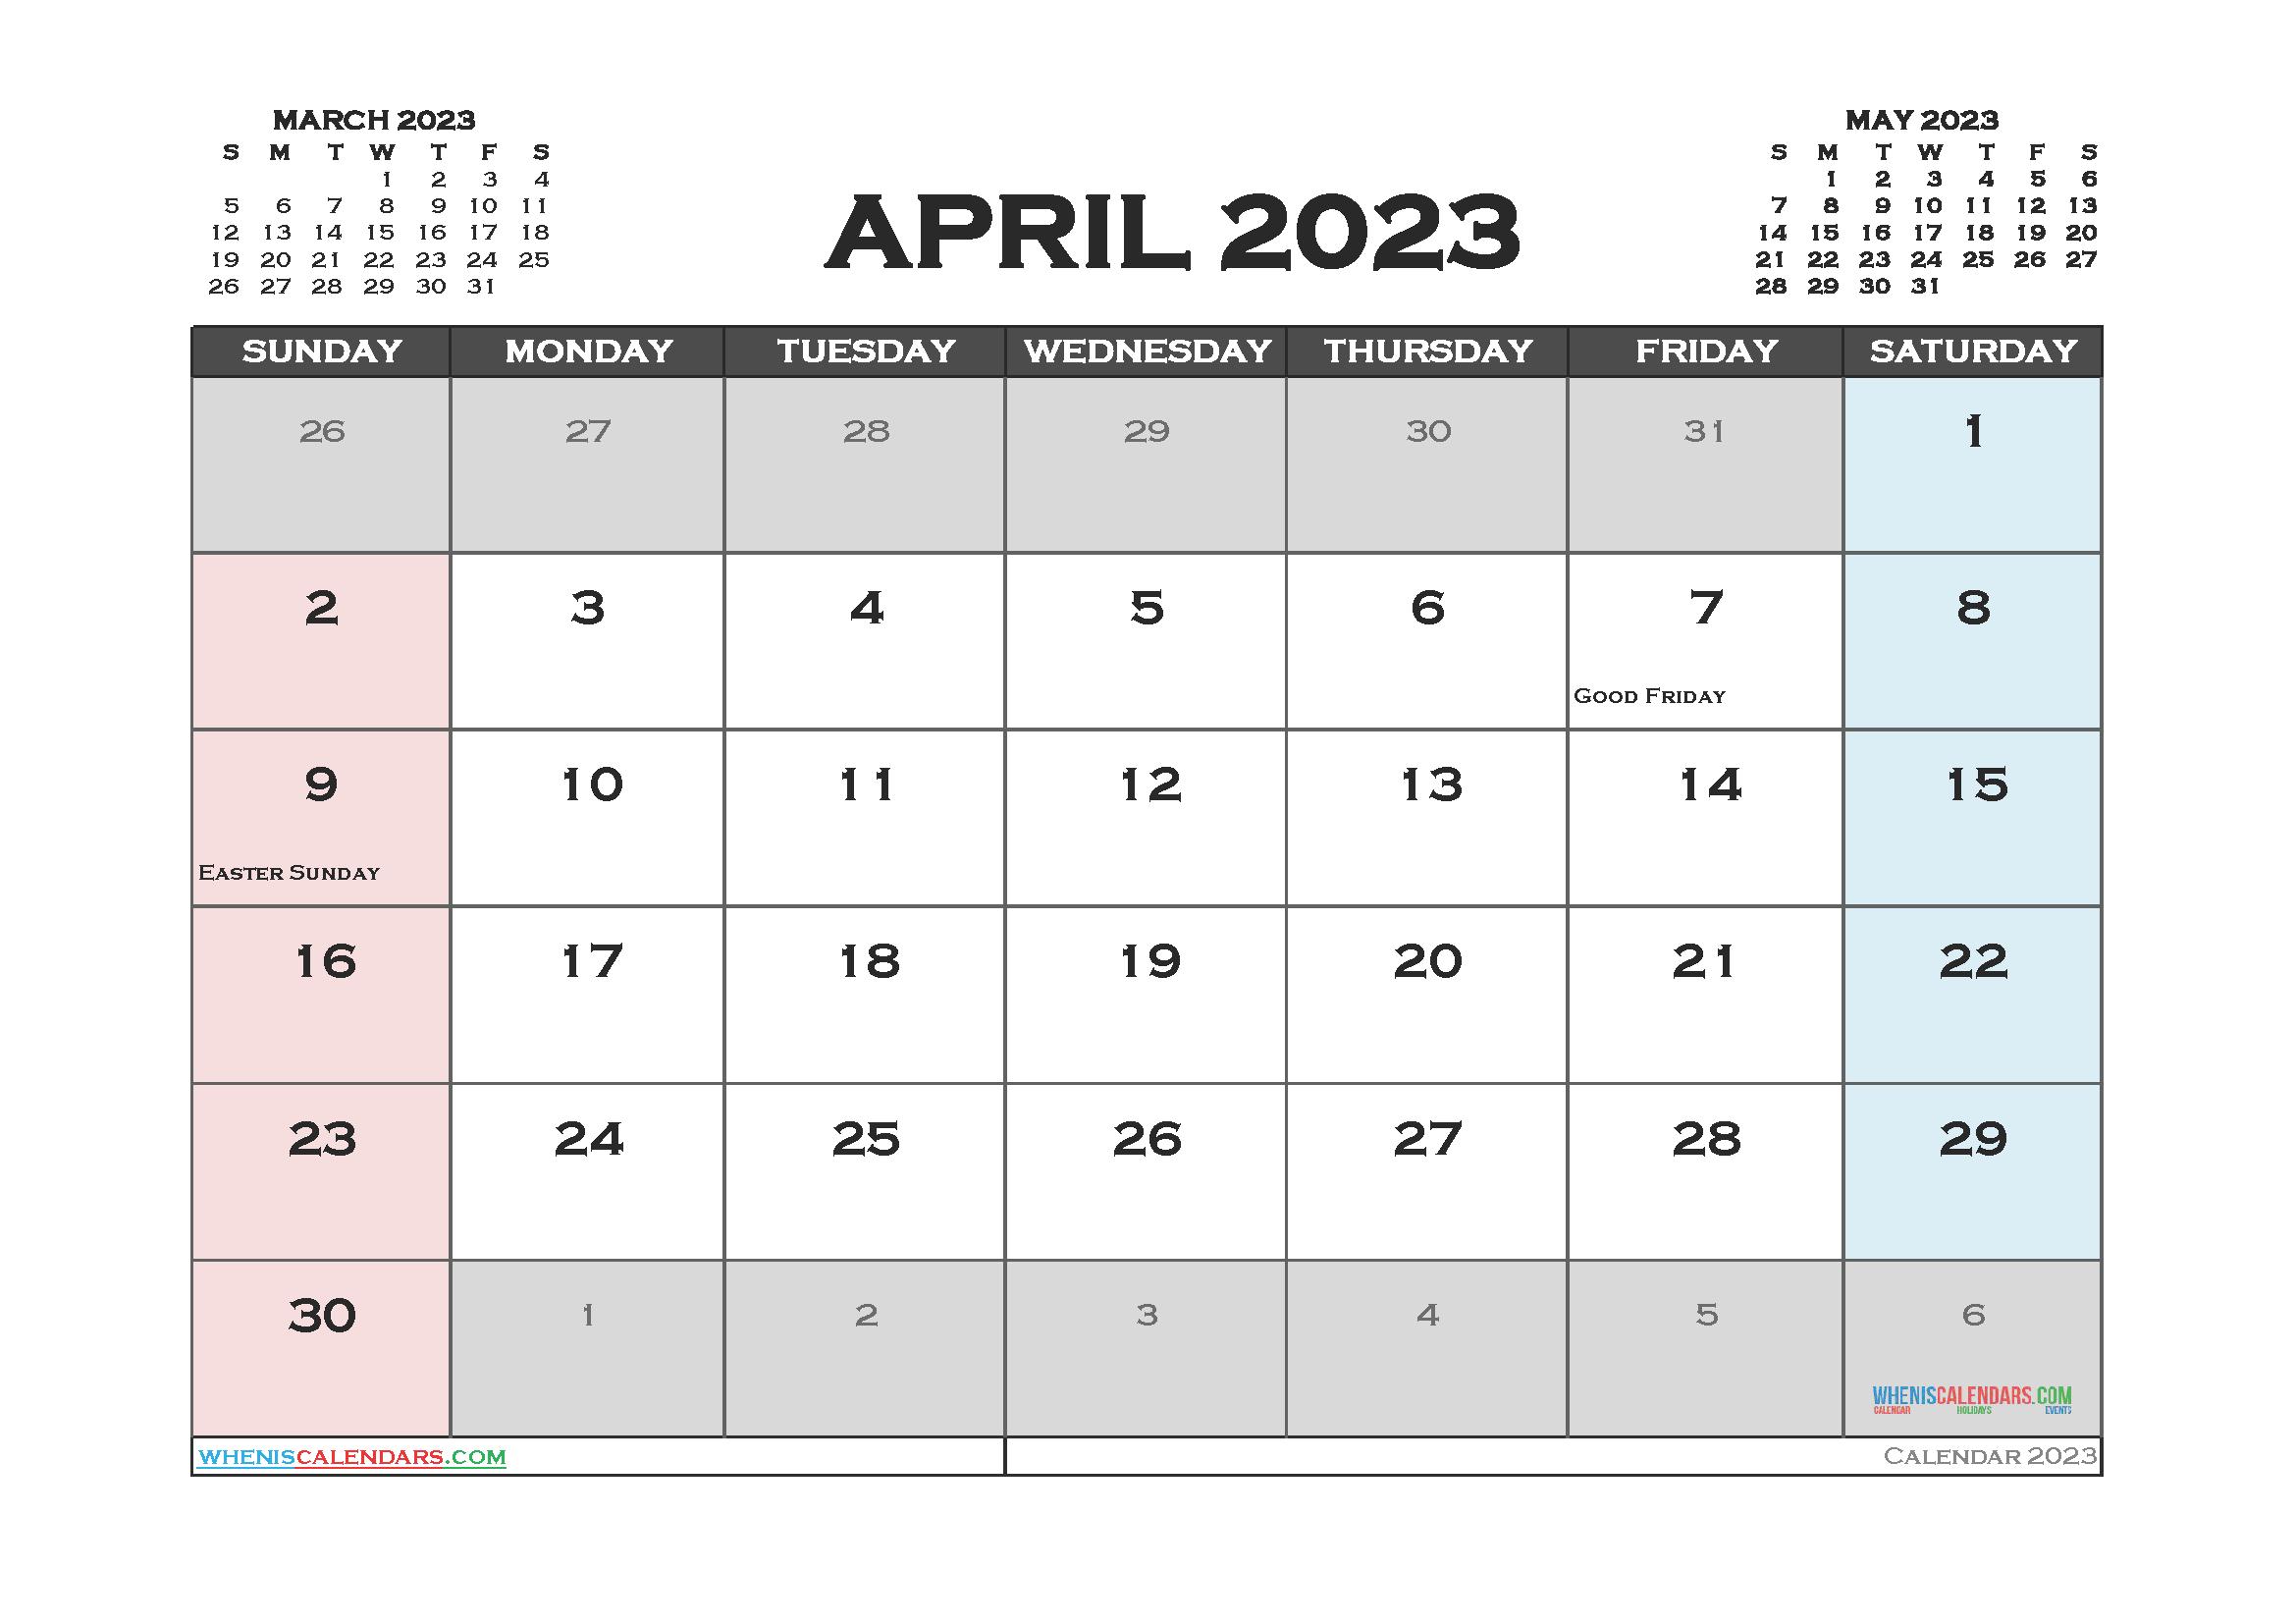 April 2023 Calendar Printable For Free